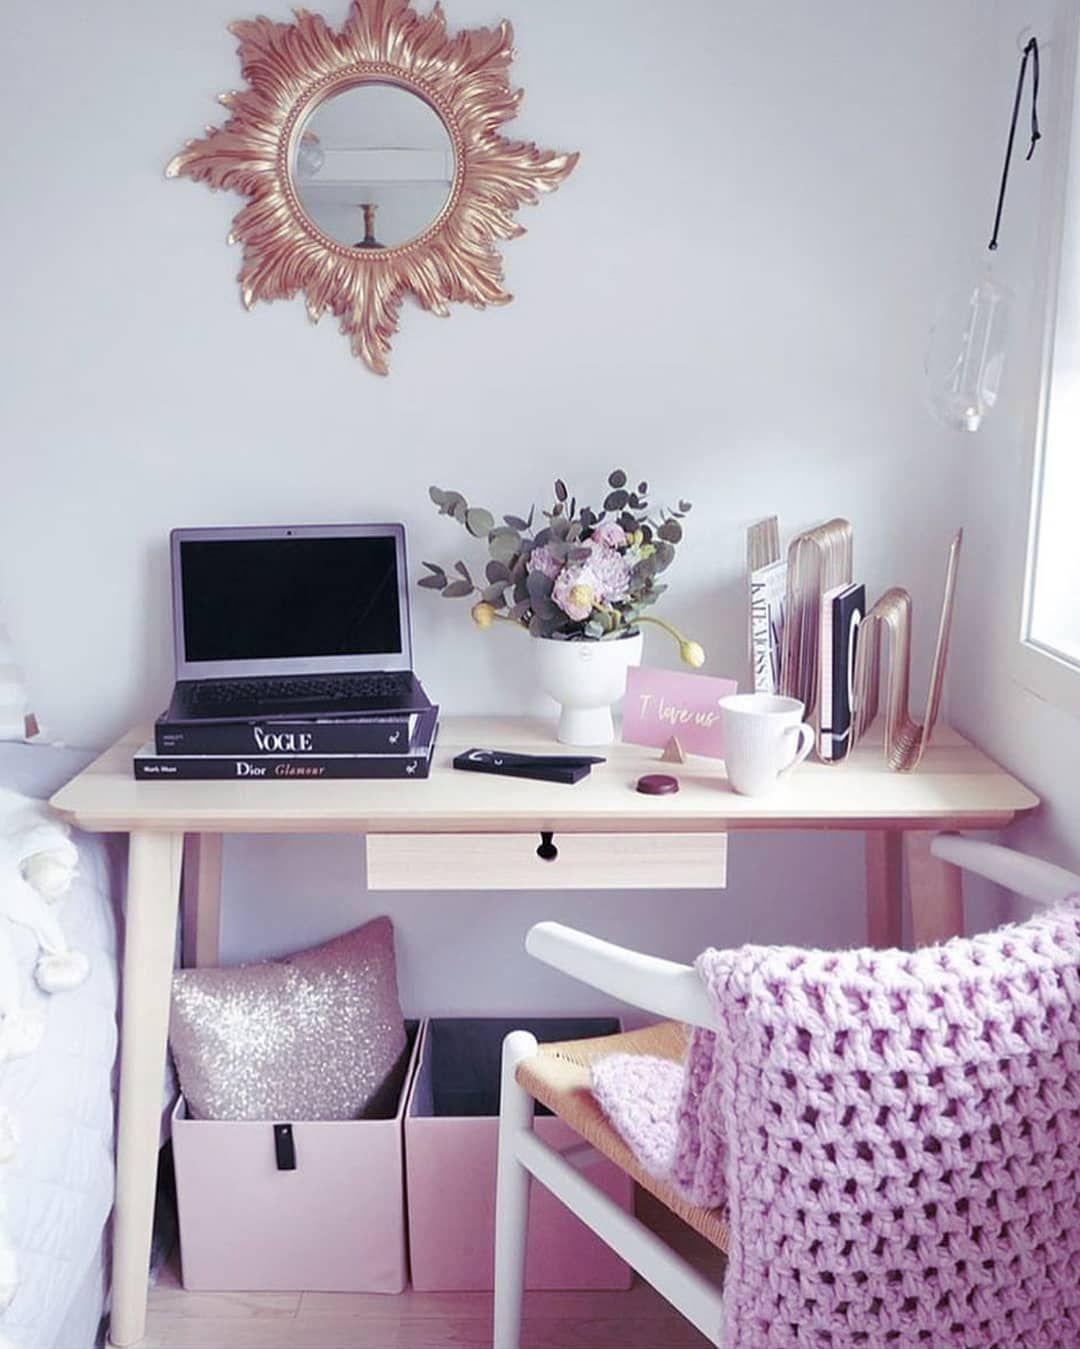 Cozy Homeoffice Decor: Adorable Little Desk Nook . . . . #desklifebliss